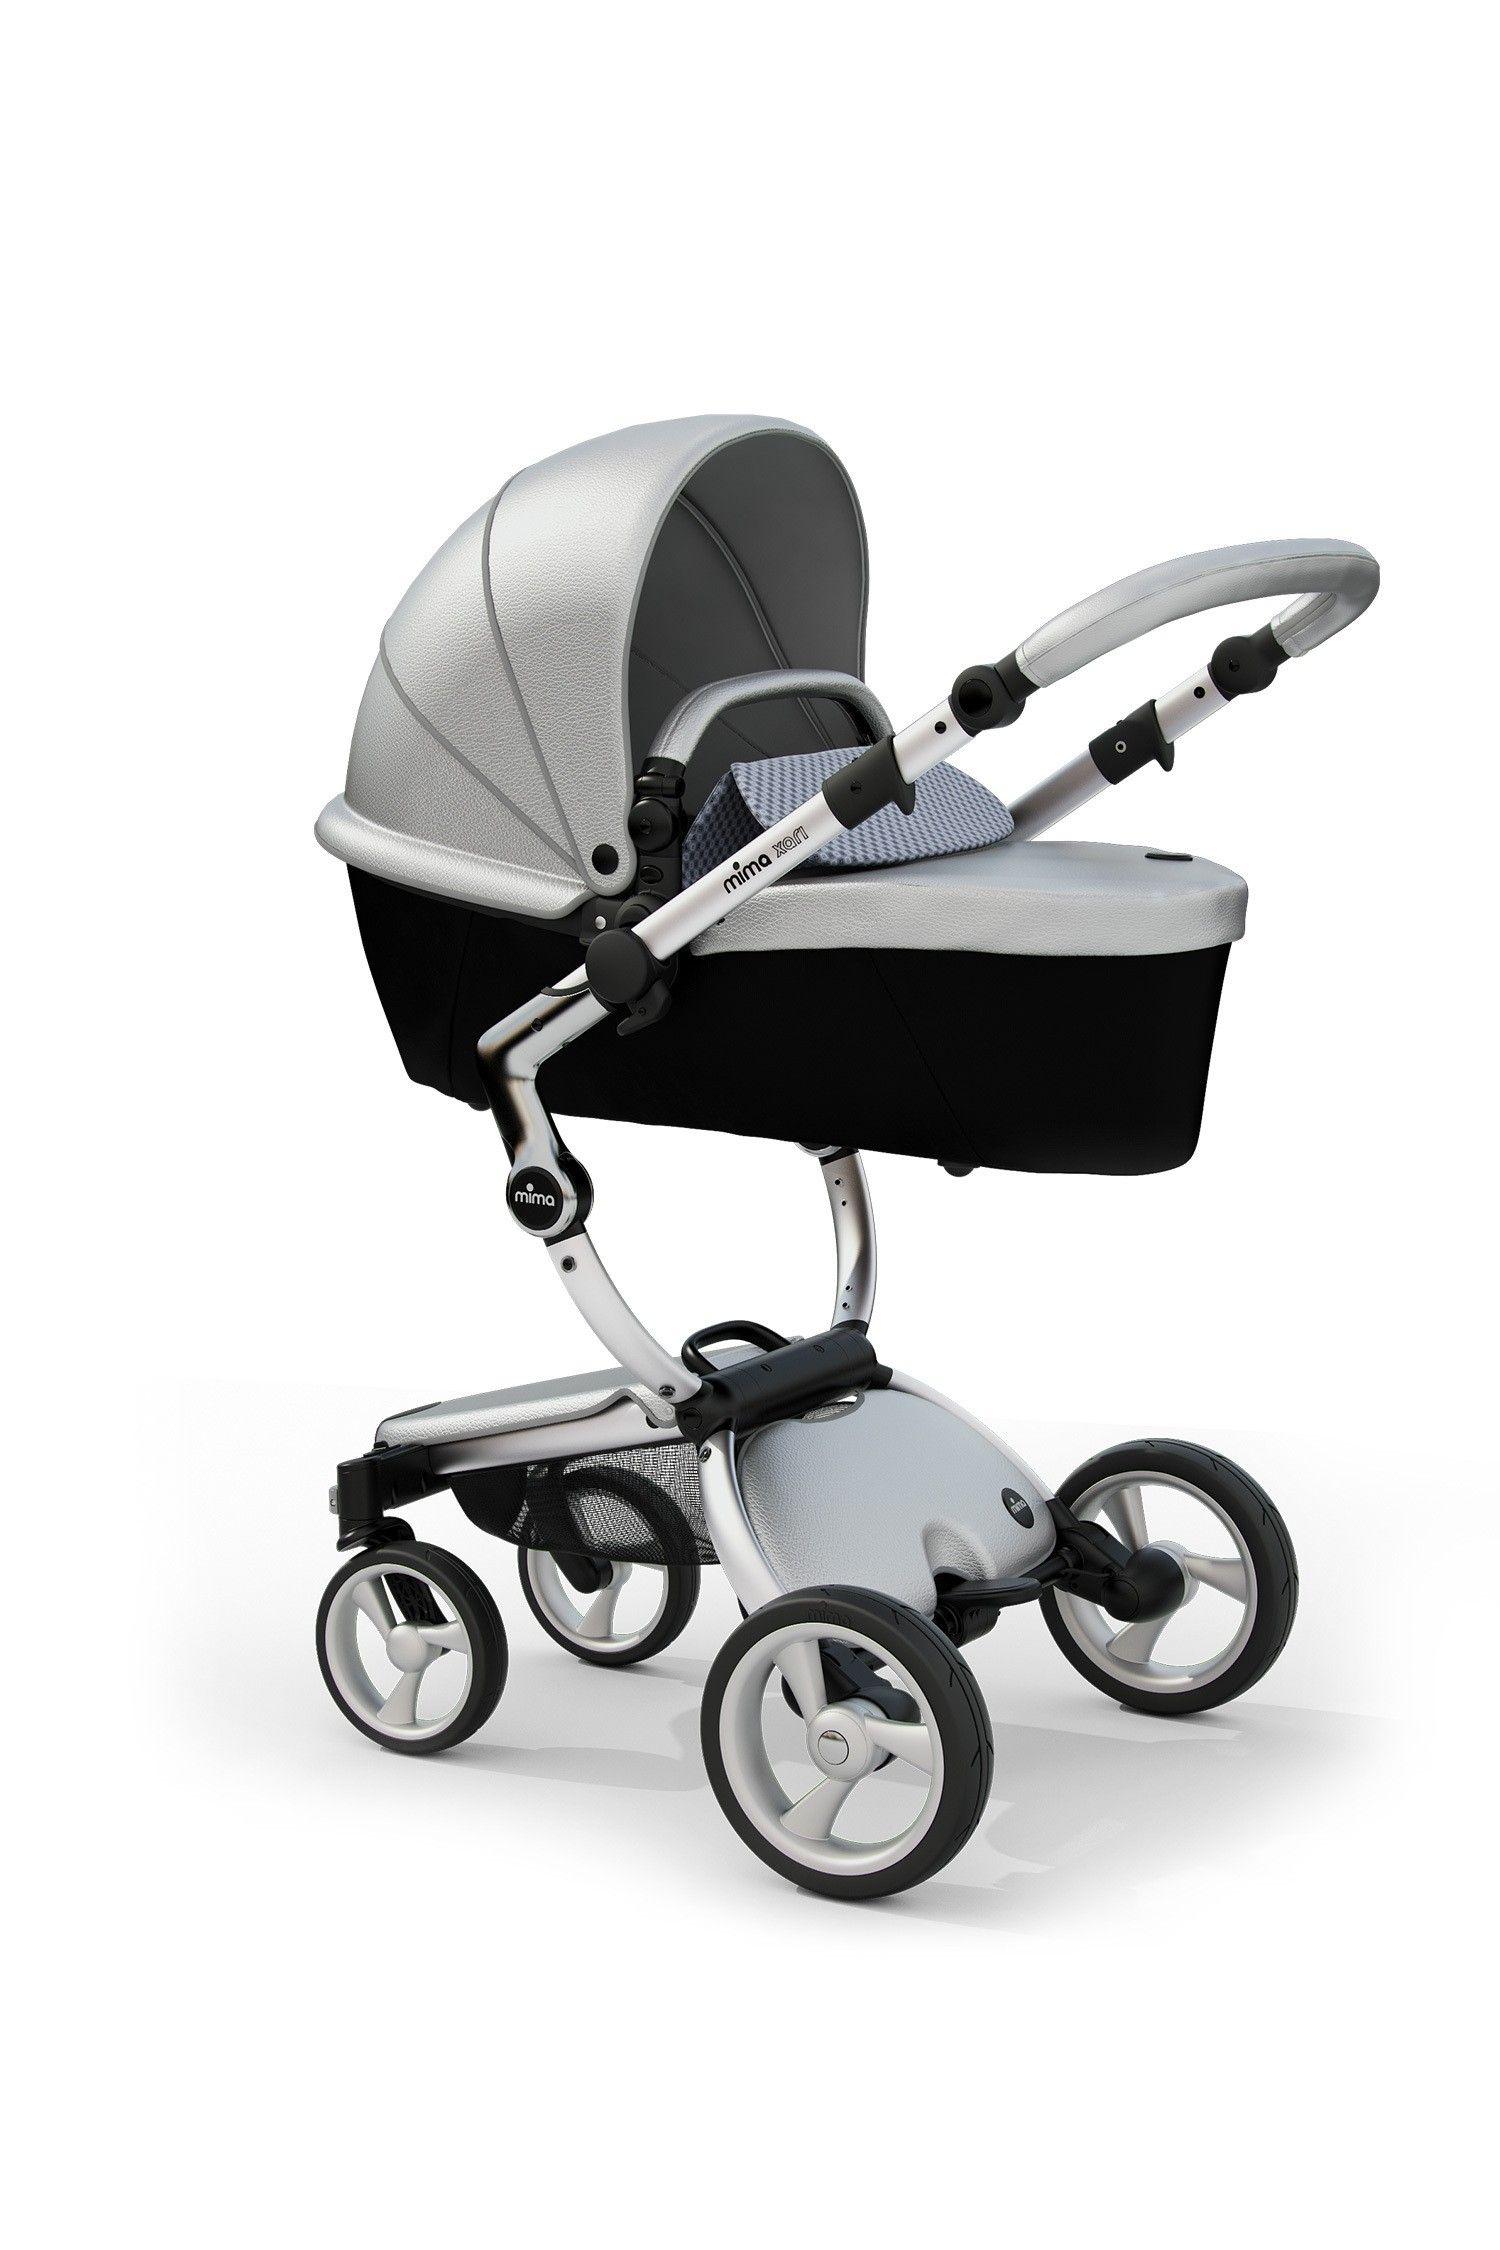 xari designer baby stroller  mima ® kids usa  baby stroller  - xari designer baby stroller  mima ® kids usa